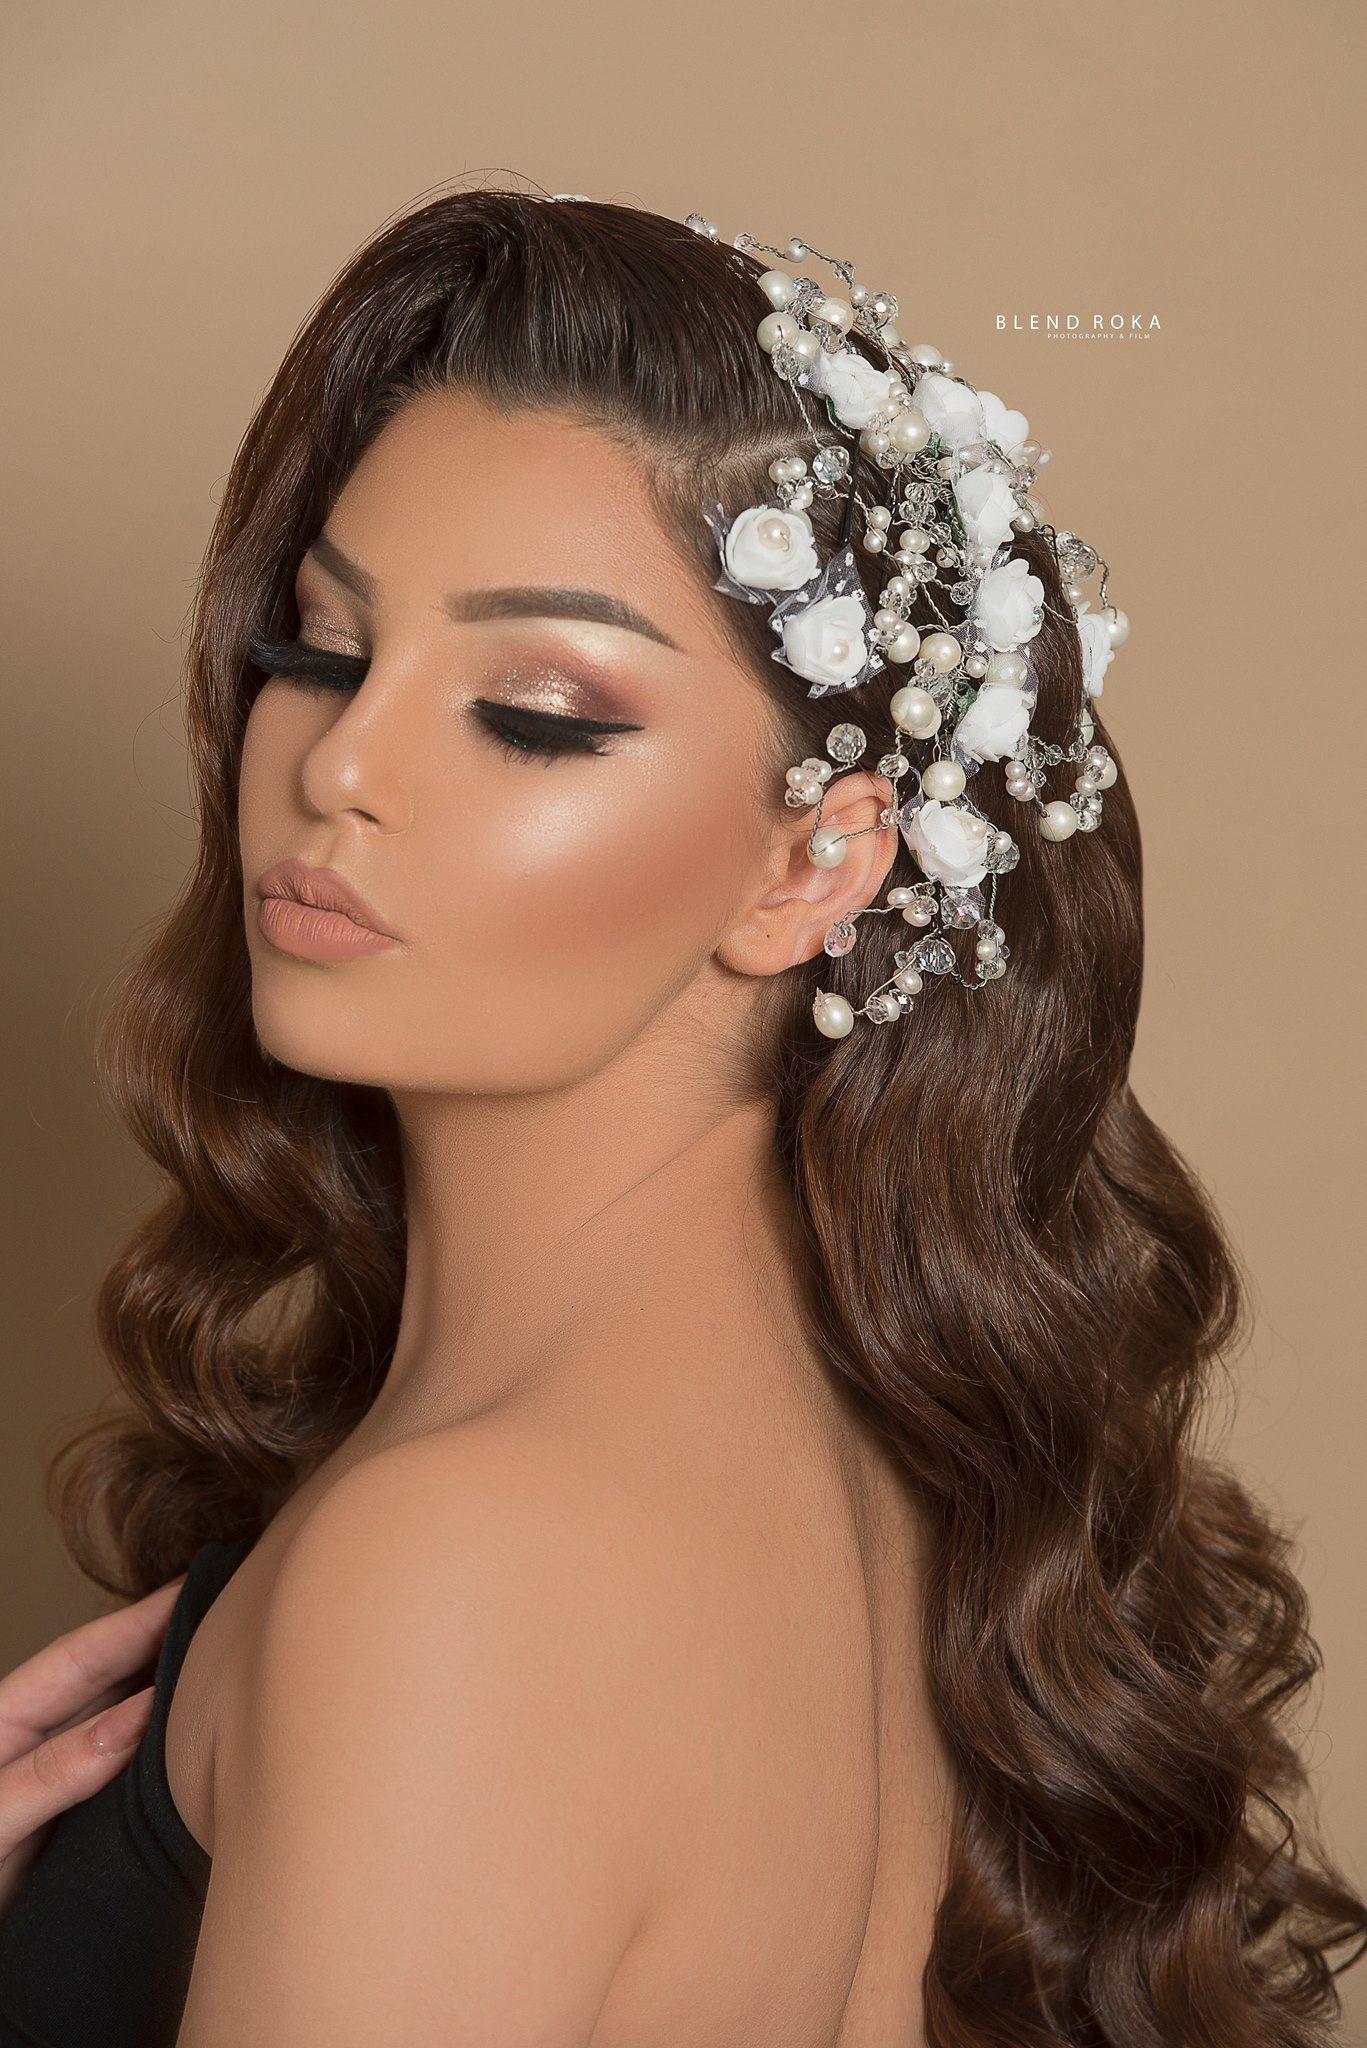 natural wedding day glam💎 | bride makeup, glam wedding